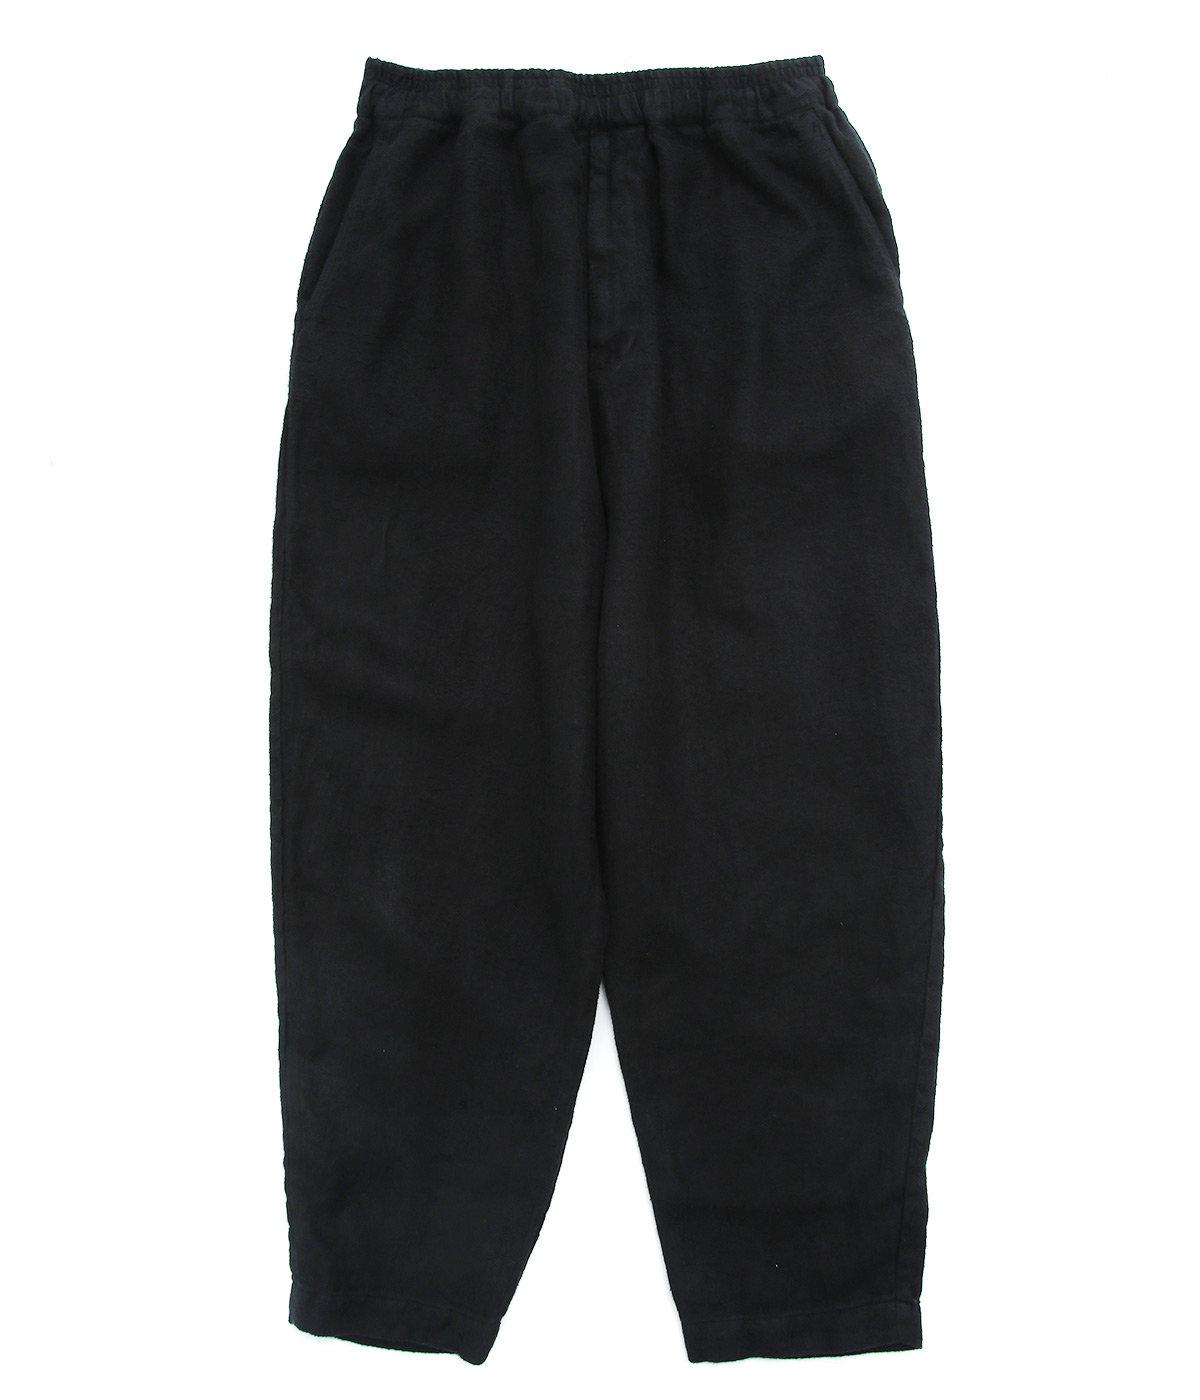 LINEN HERRINGBONE EASY PANTS